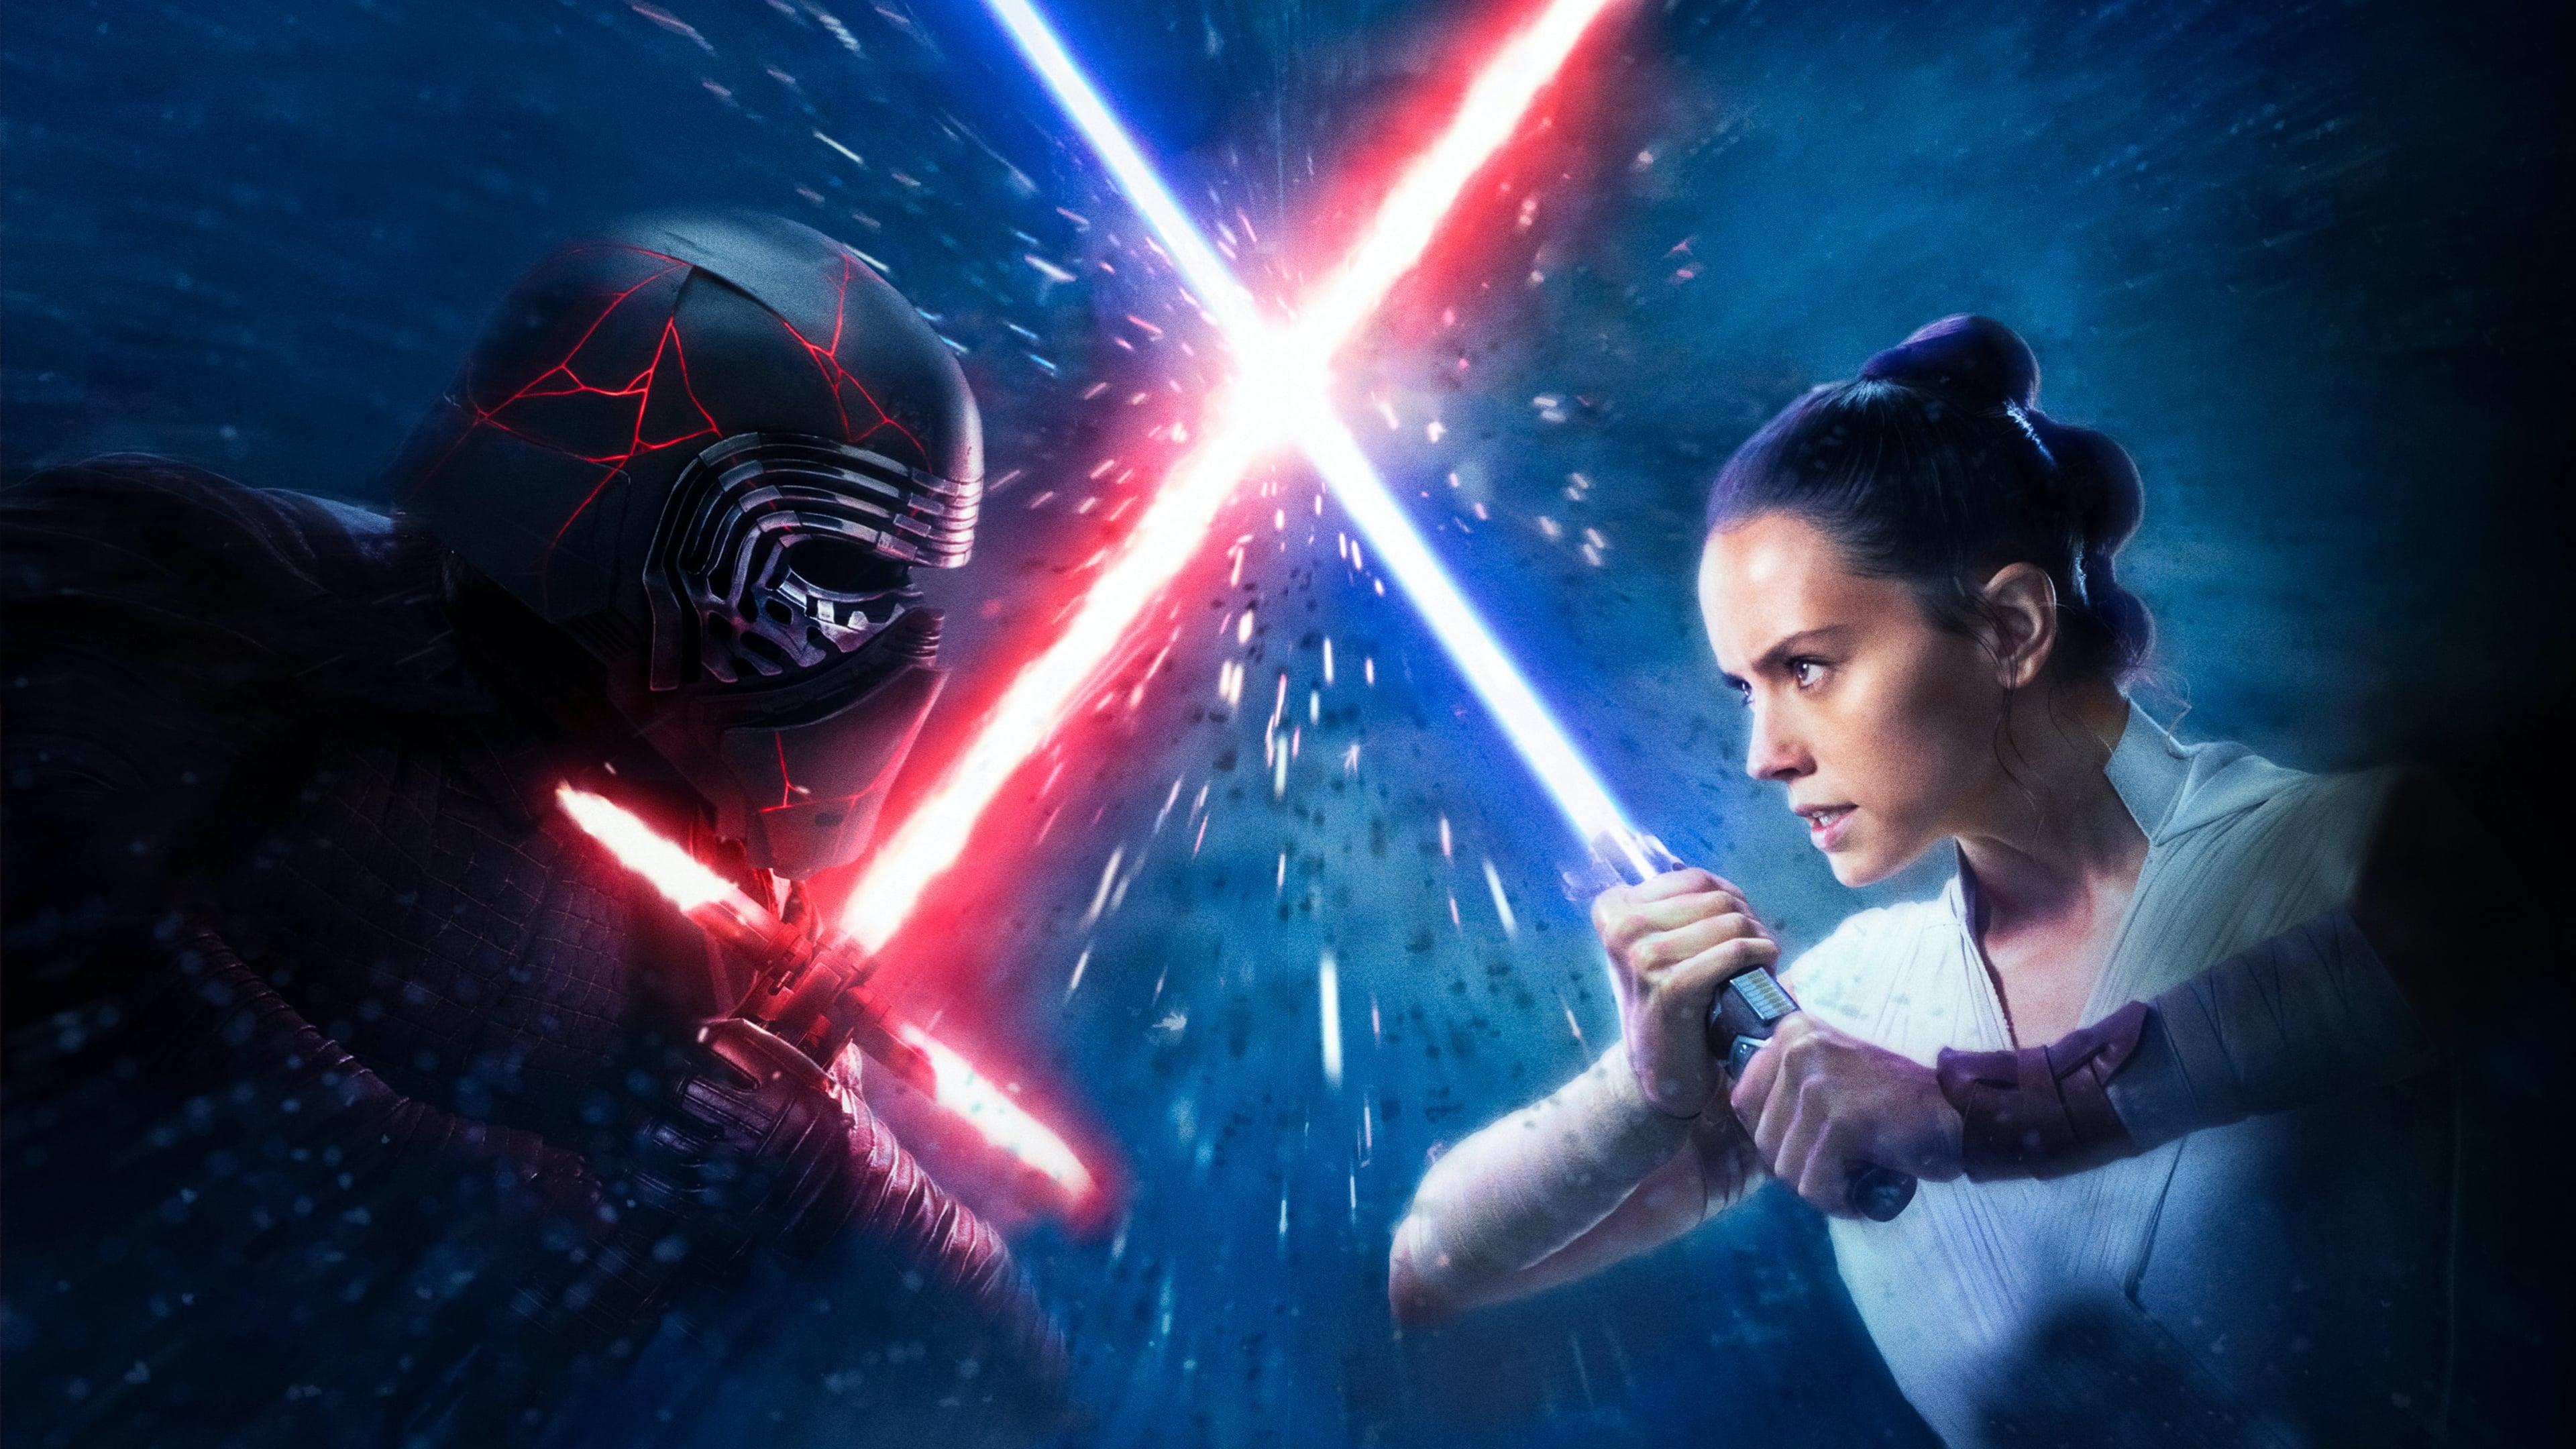 Star Wars The Rise of Skywalker Honest Review (1)